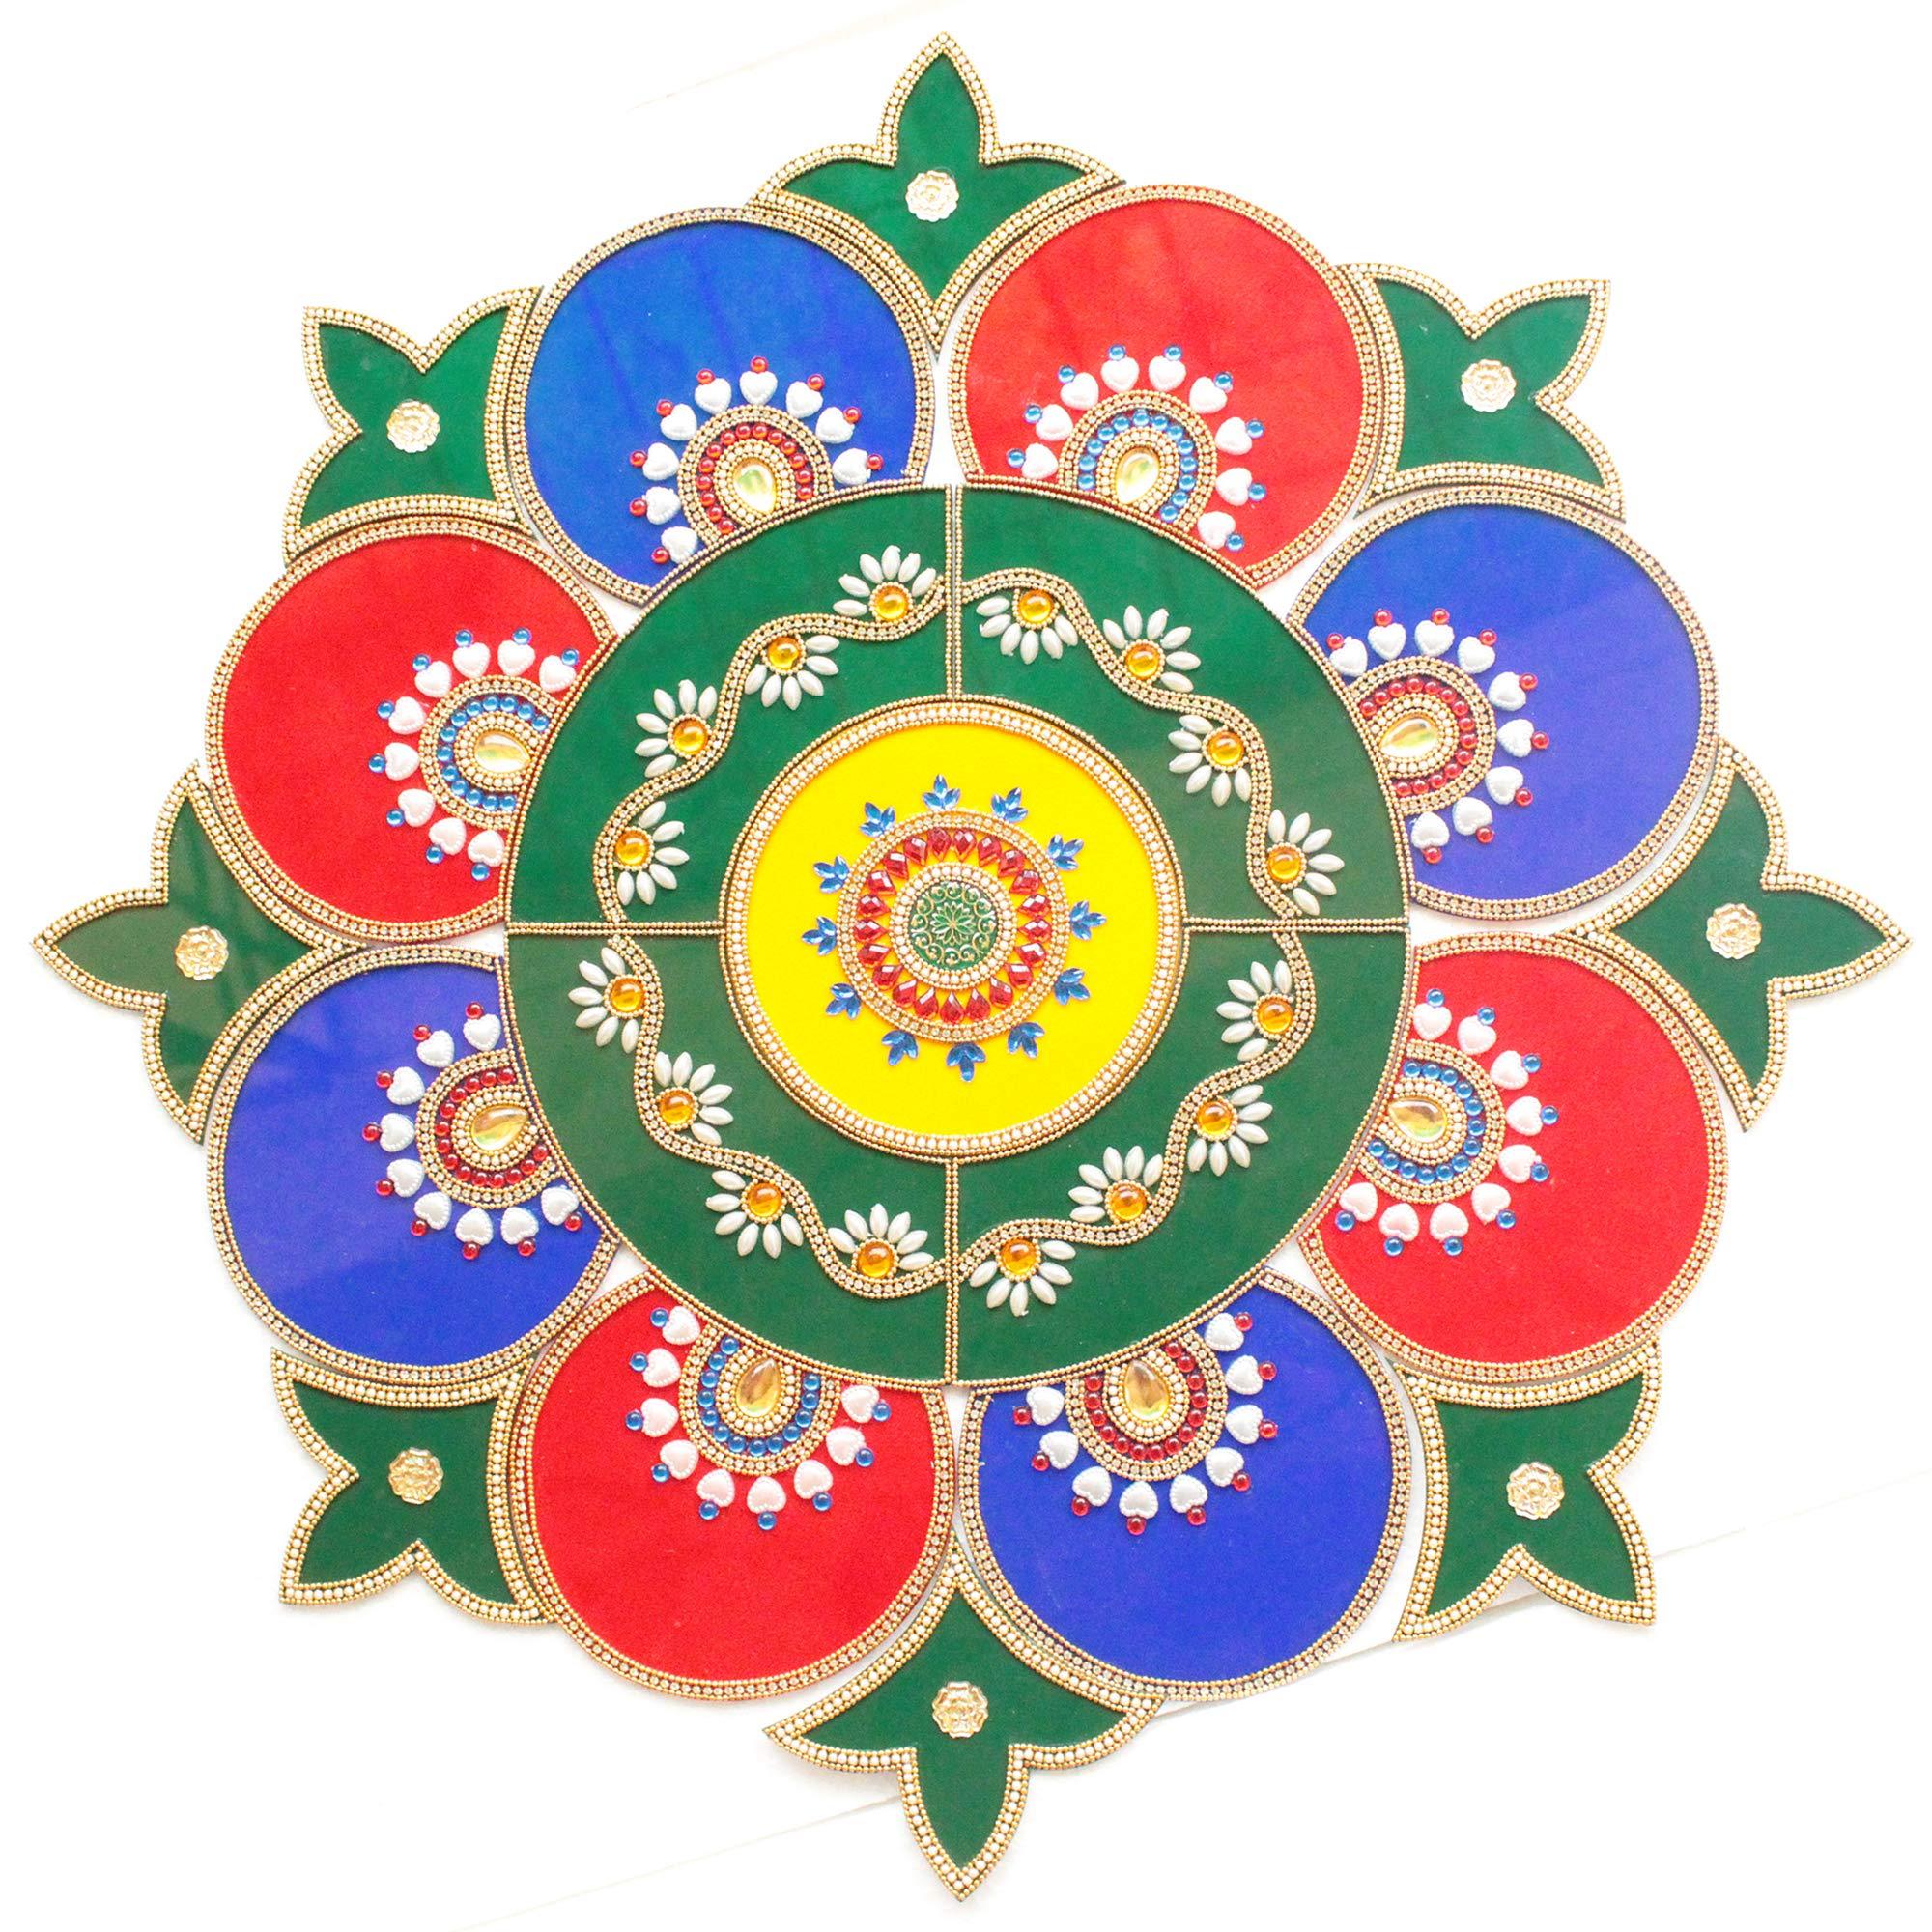 Ethnic Avenue Geometric Mandala Wall/Floor / Table Decorations - 21 Piece Acrylic Handmade Home Decor Accents